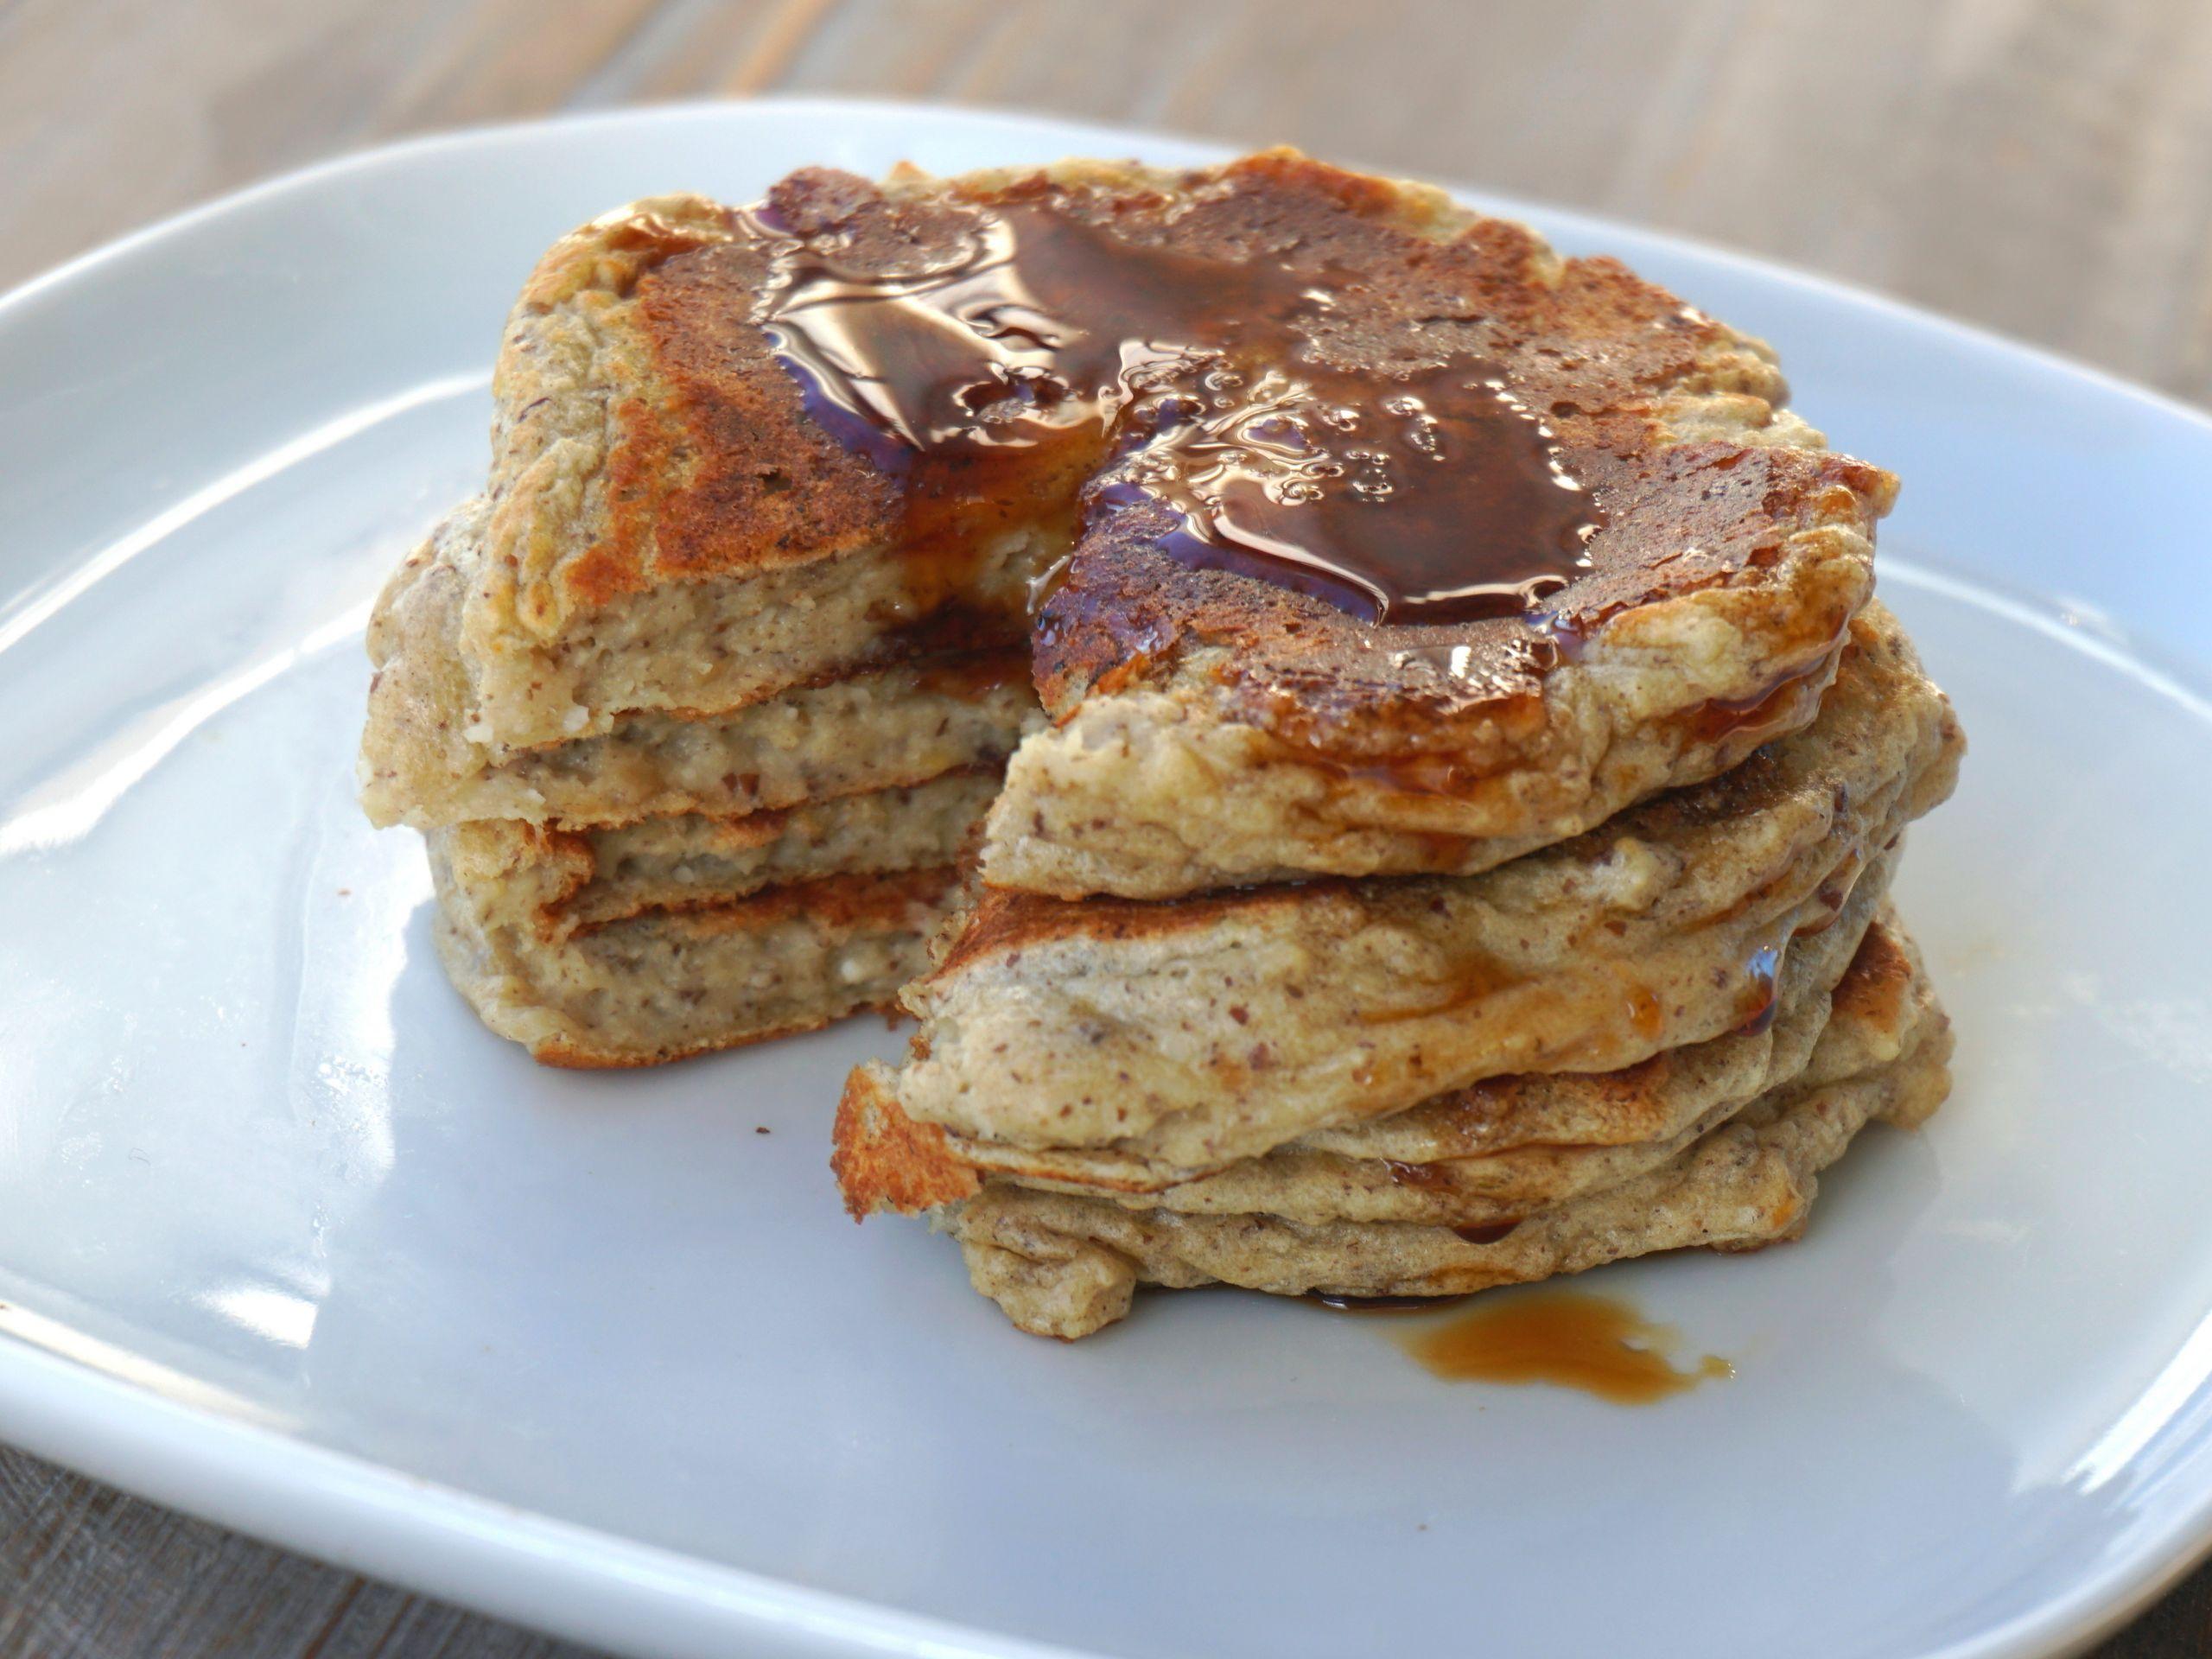 Vegan Protein Recipes Low Carb  Vegan protein pancakes low carb – LowCarb Vegan